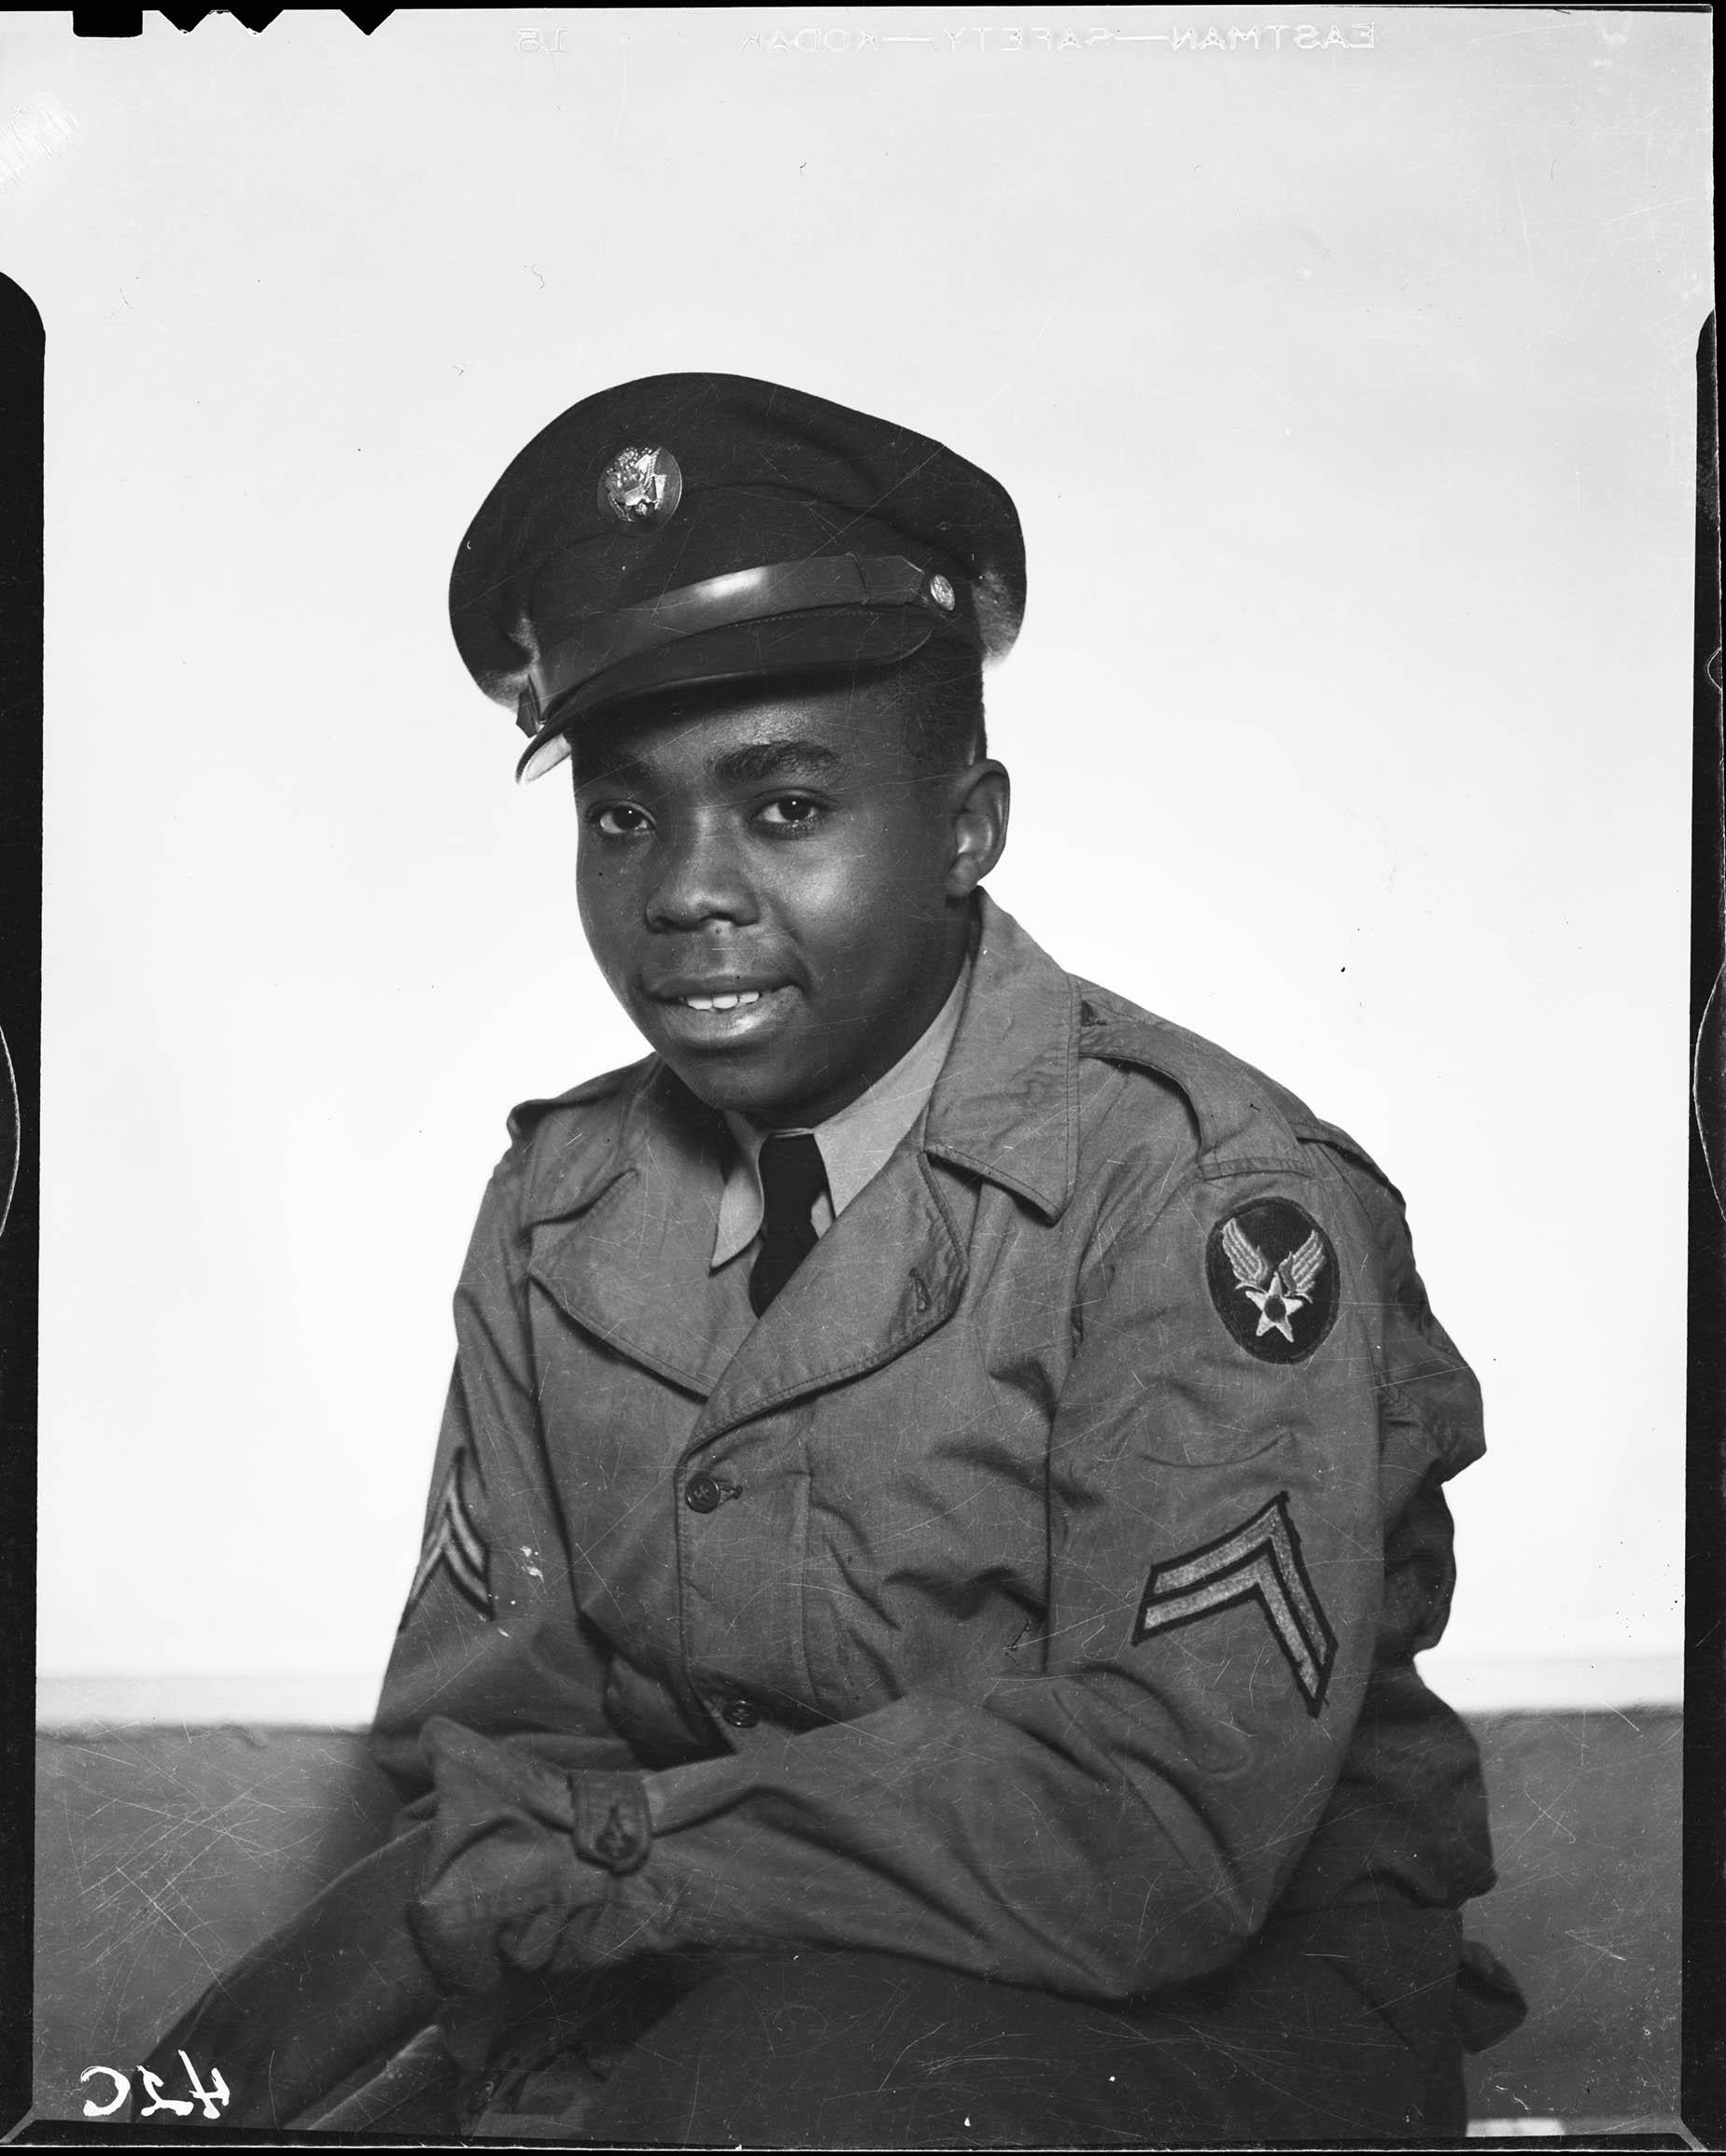 Three quarter portrait of smiling man wearing U S  army